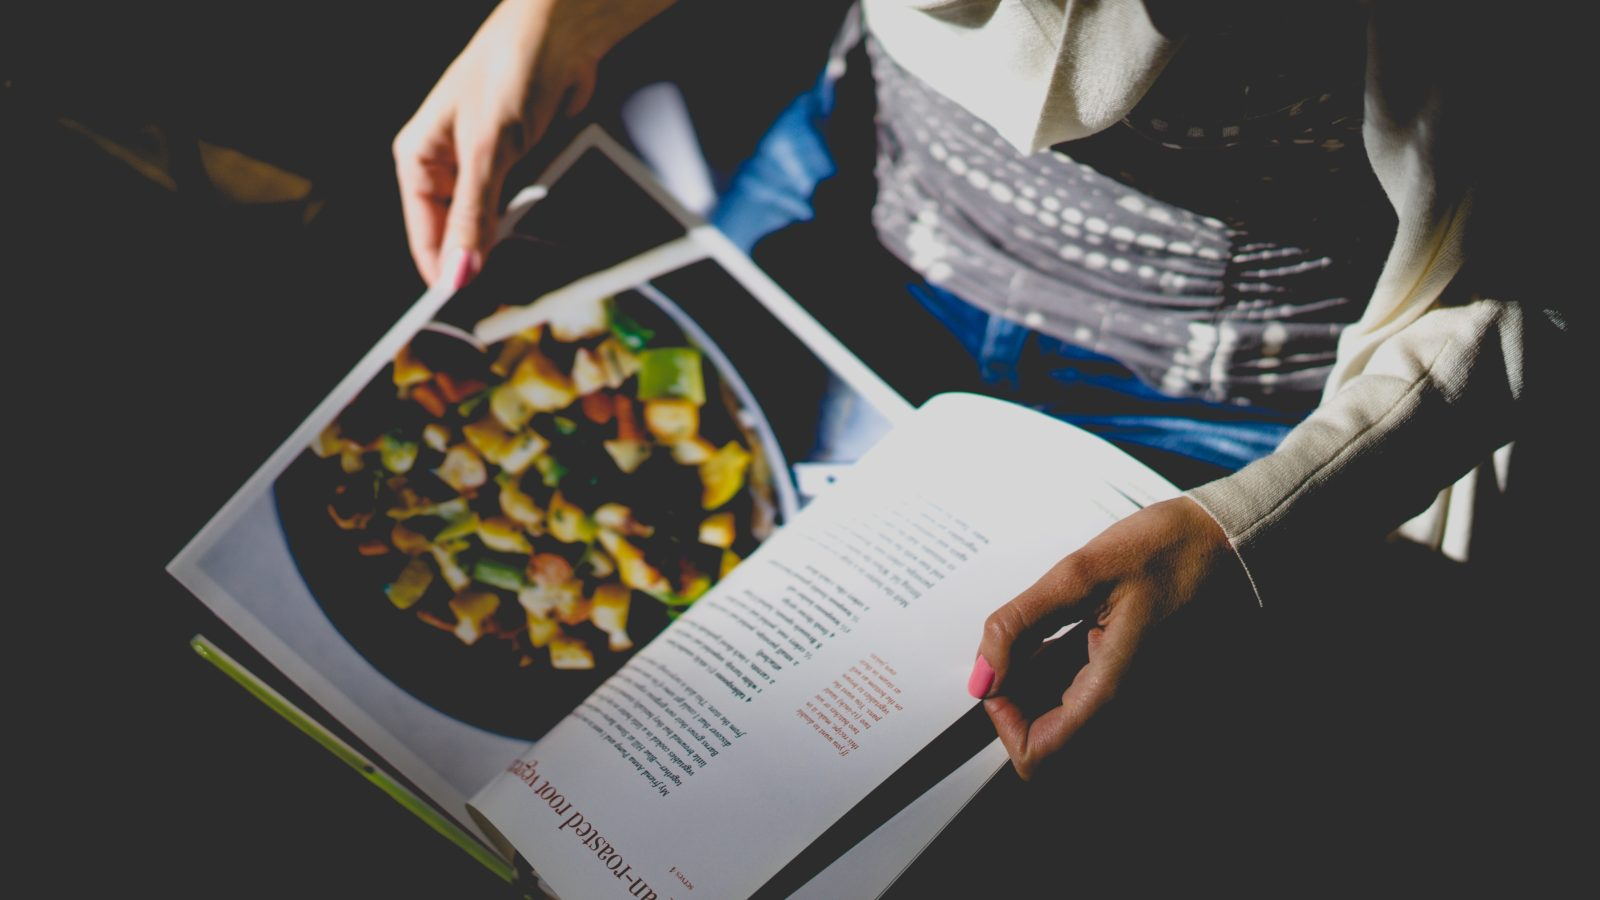 Cinco lecturas recomendadas de gastronomía